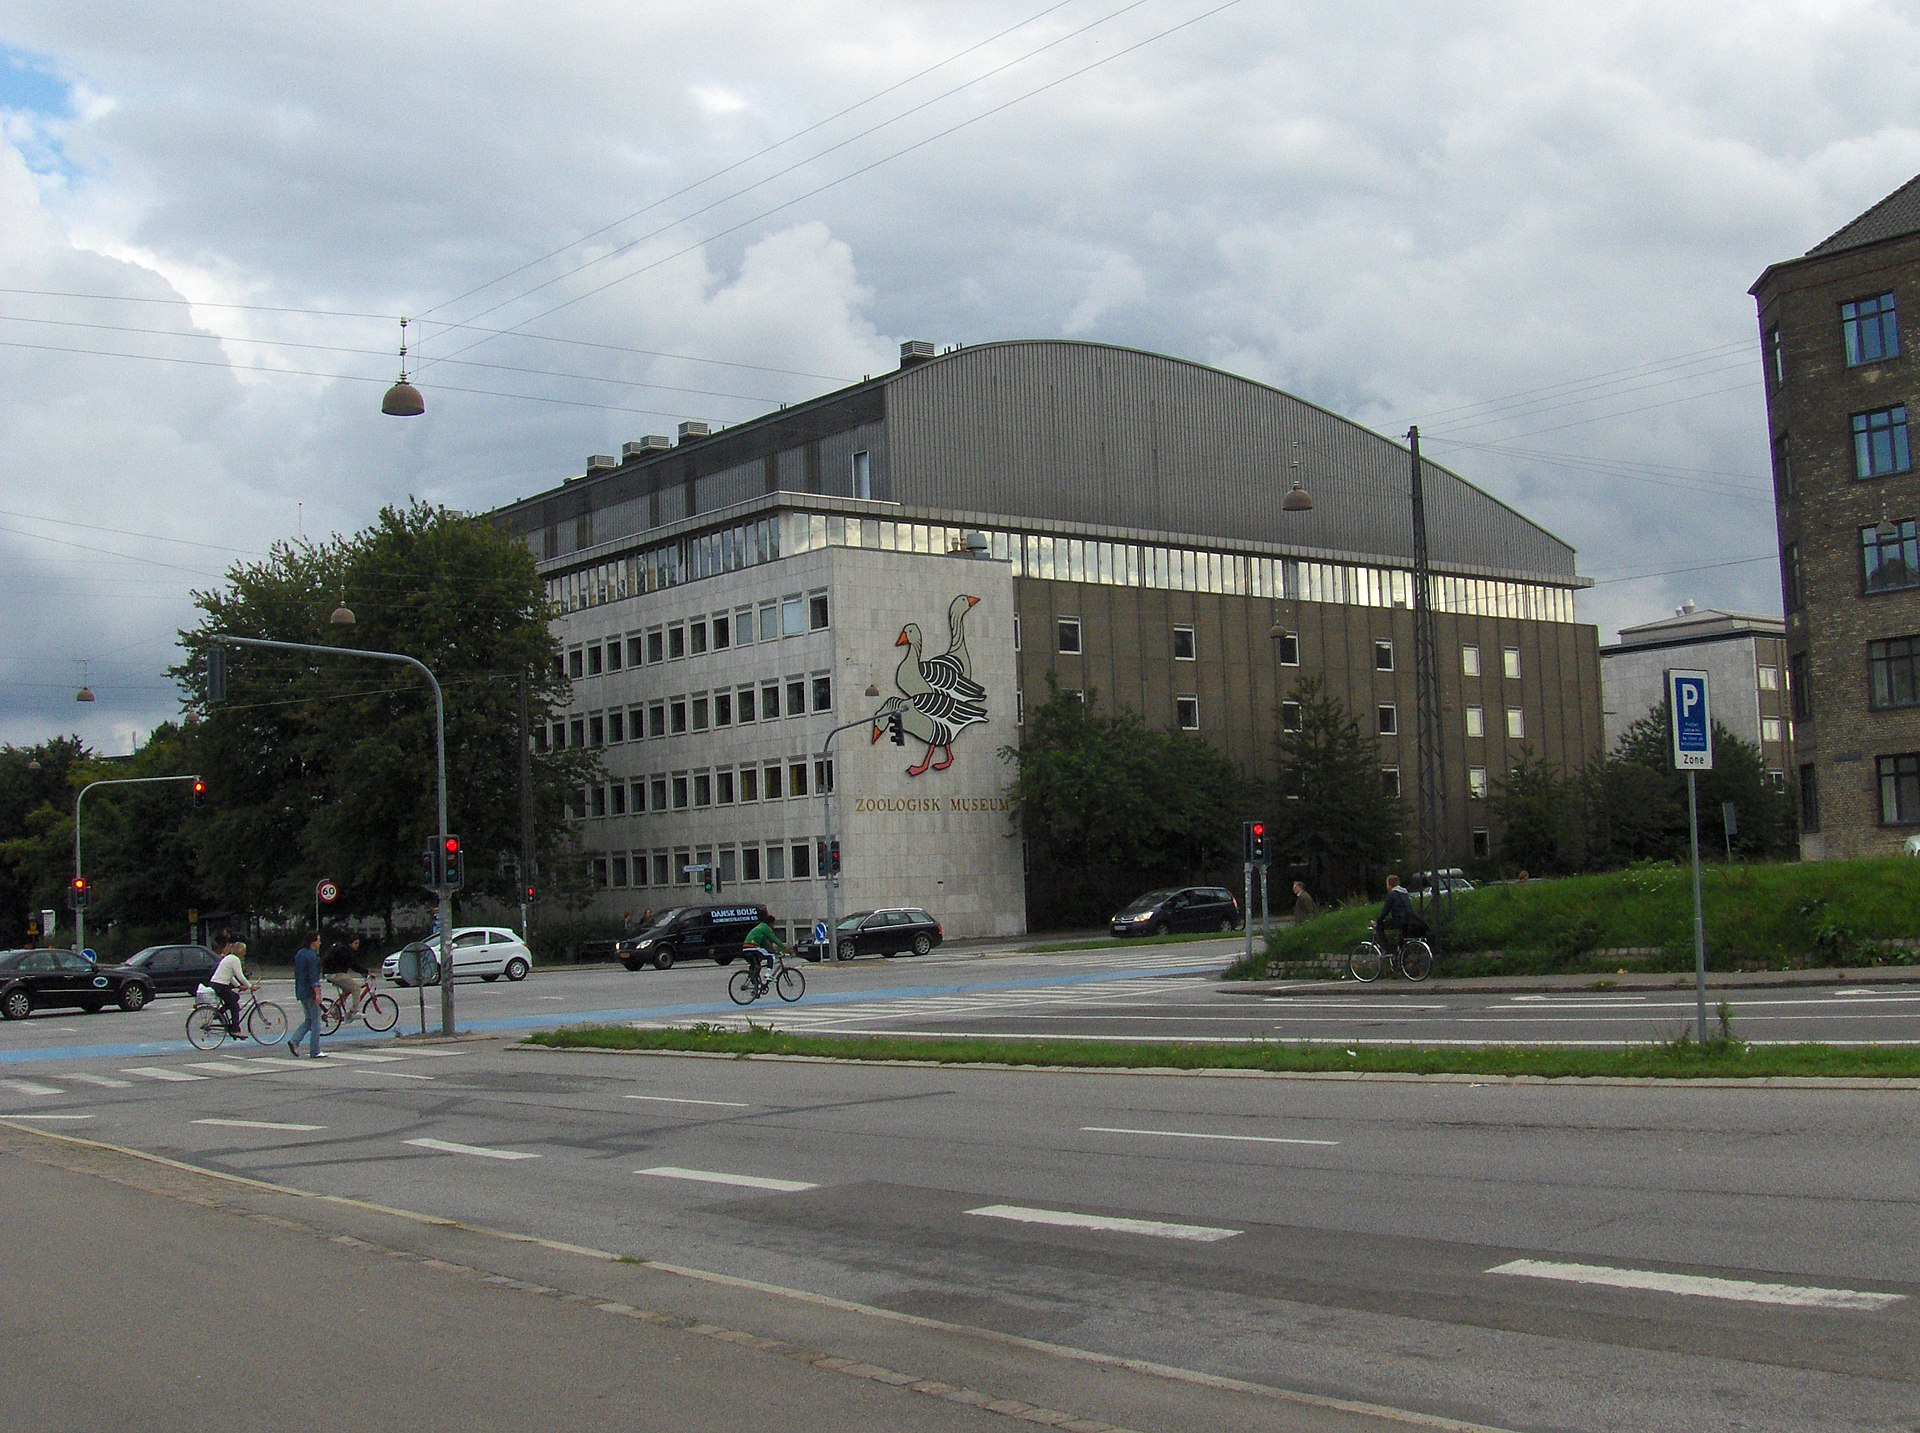 domina Danmark Museer København gratis